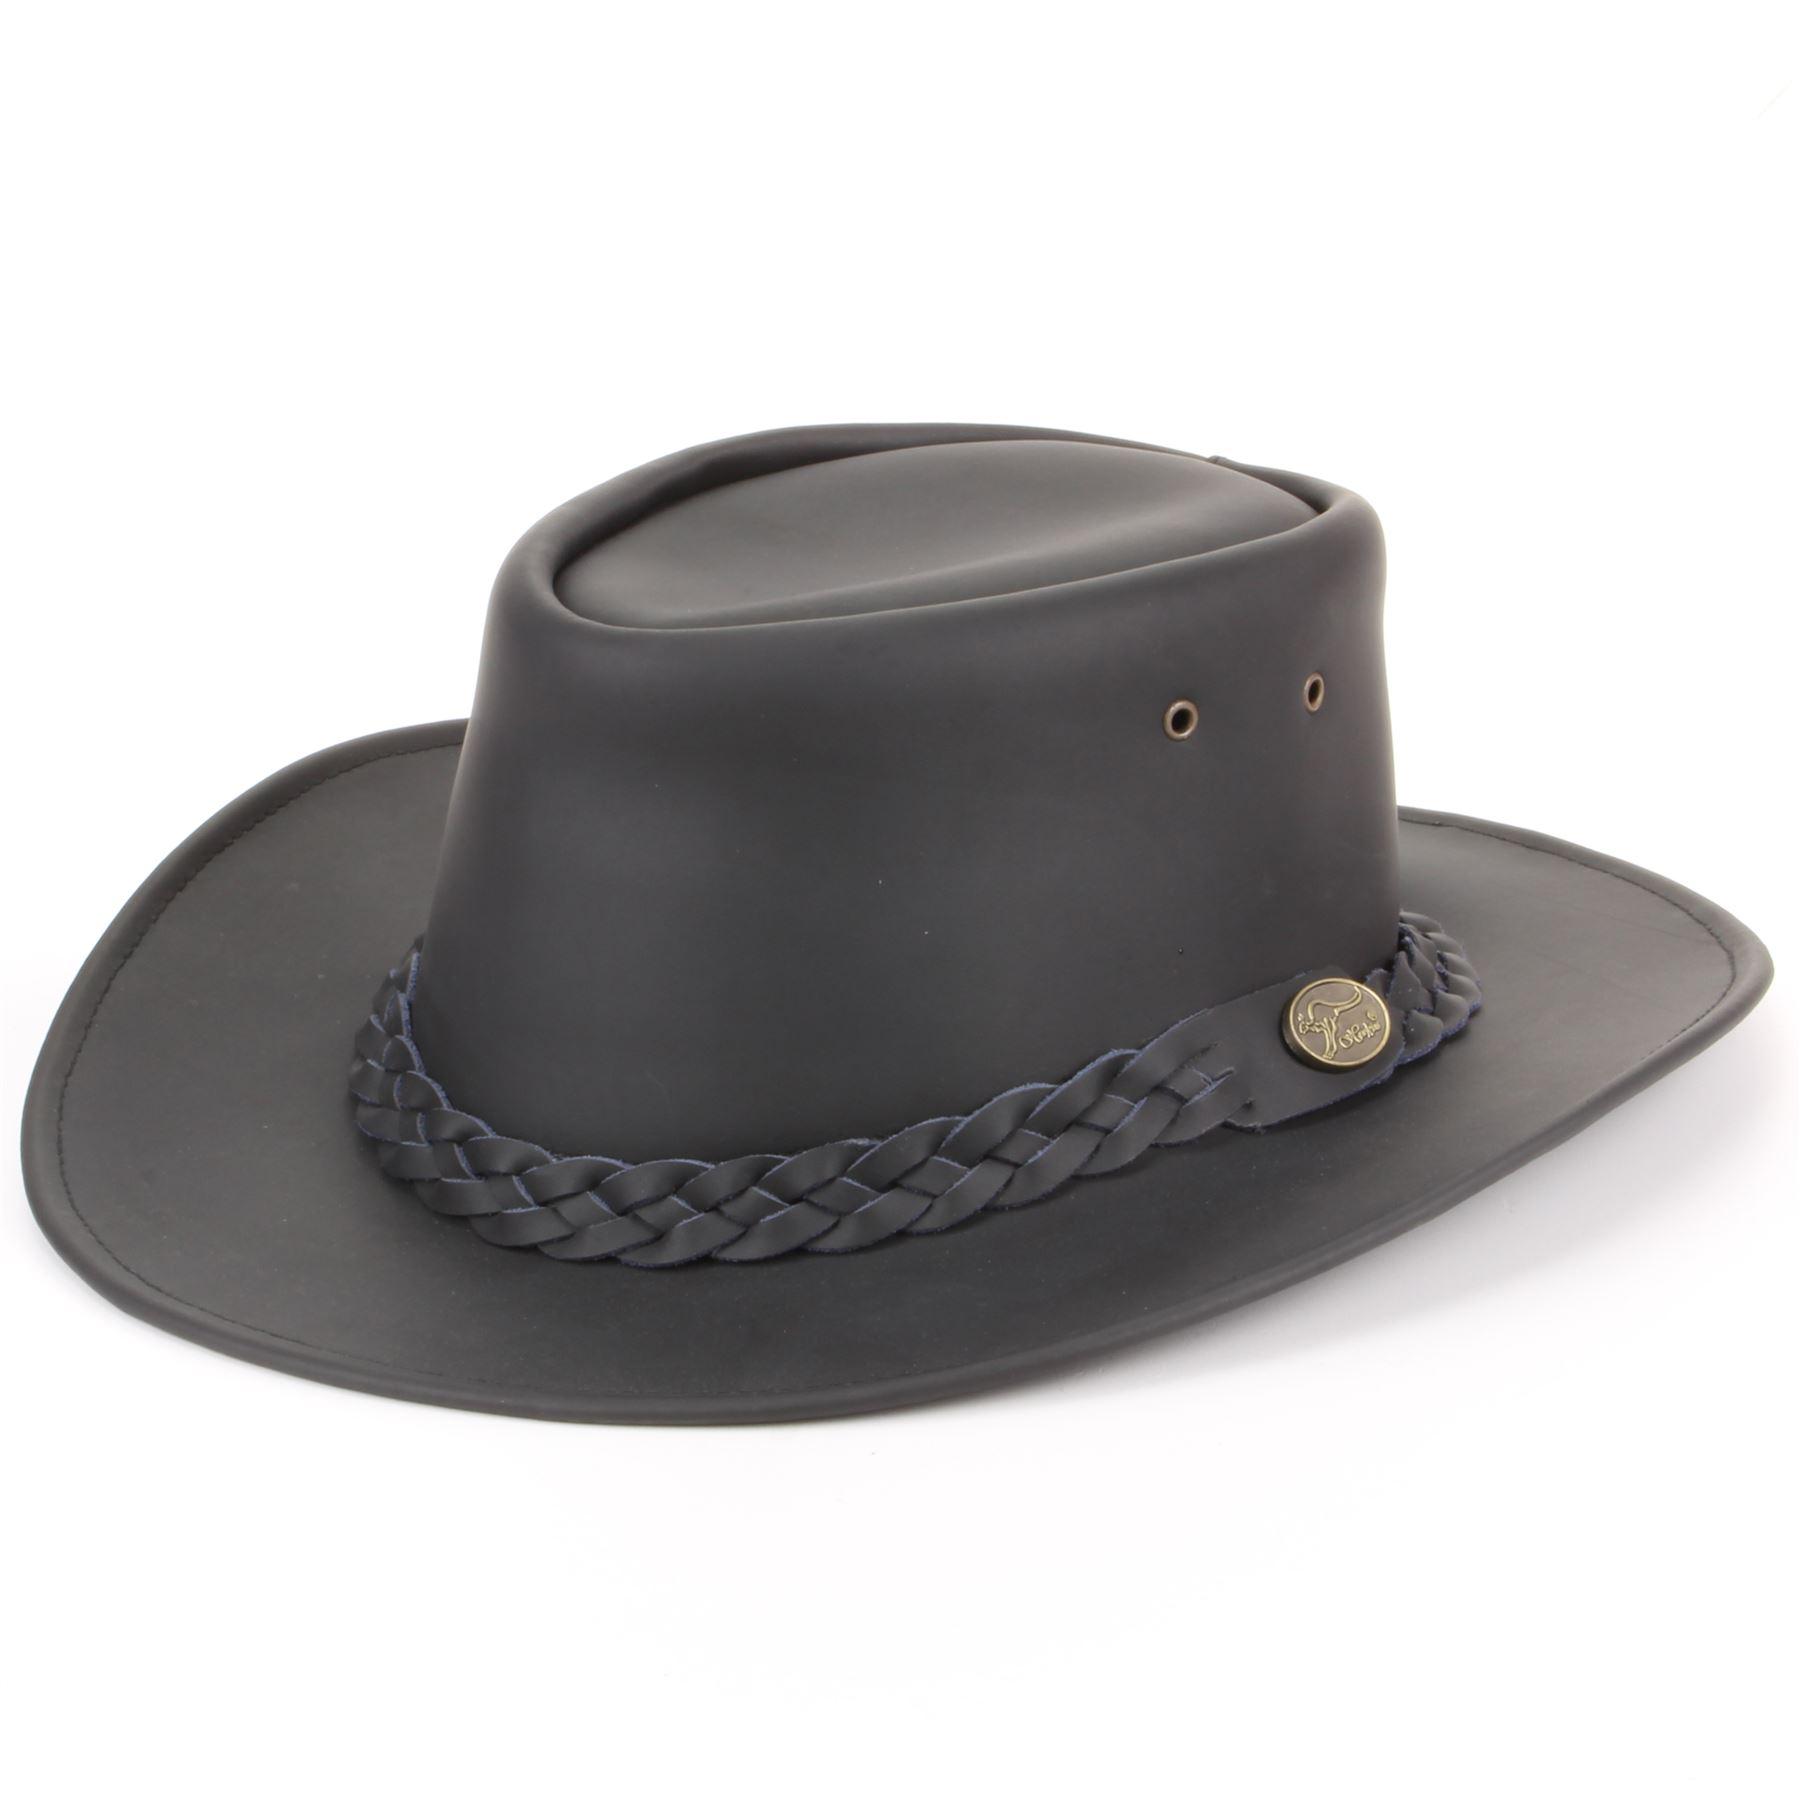 e4154a9a1cc5d Sombrero de Cowboy Australiano Bush Sombrero Piel Auténtica Negra ...